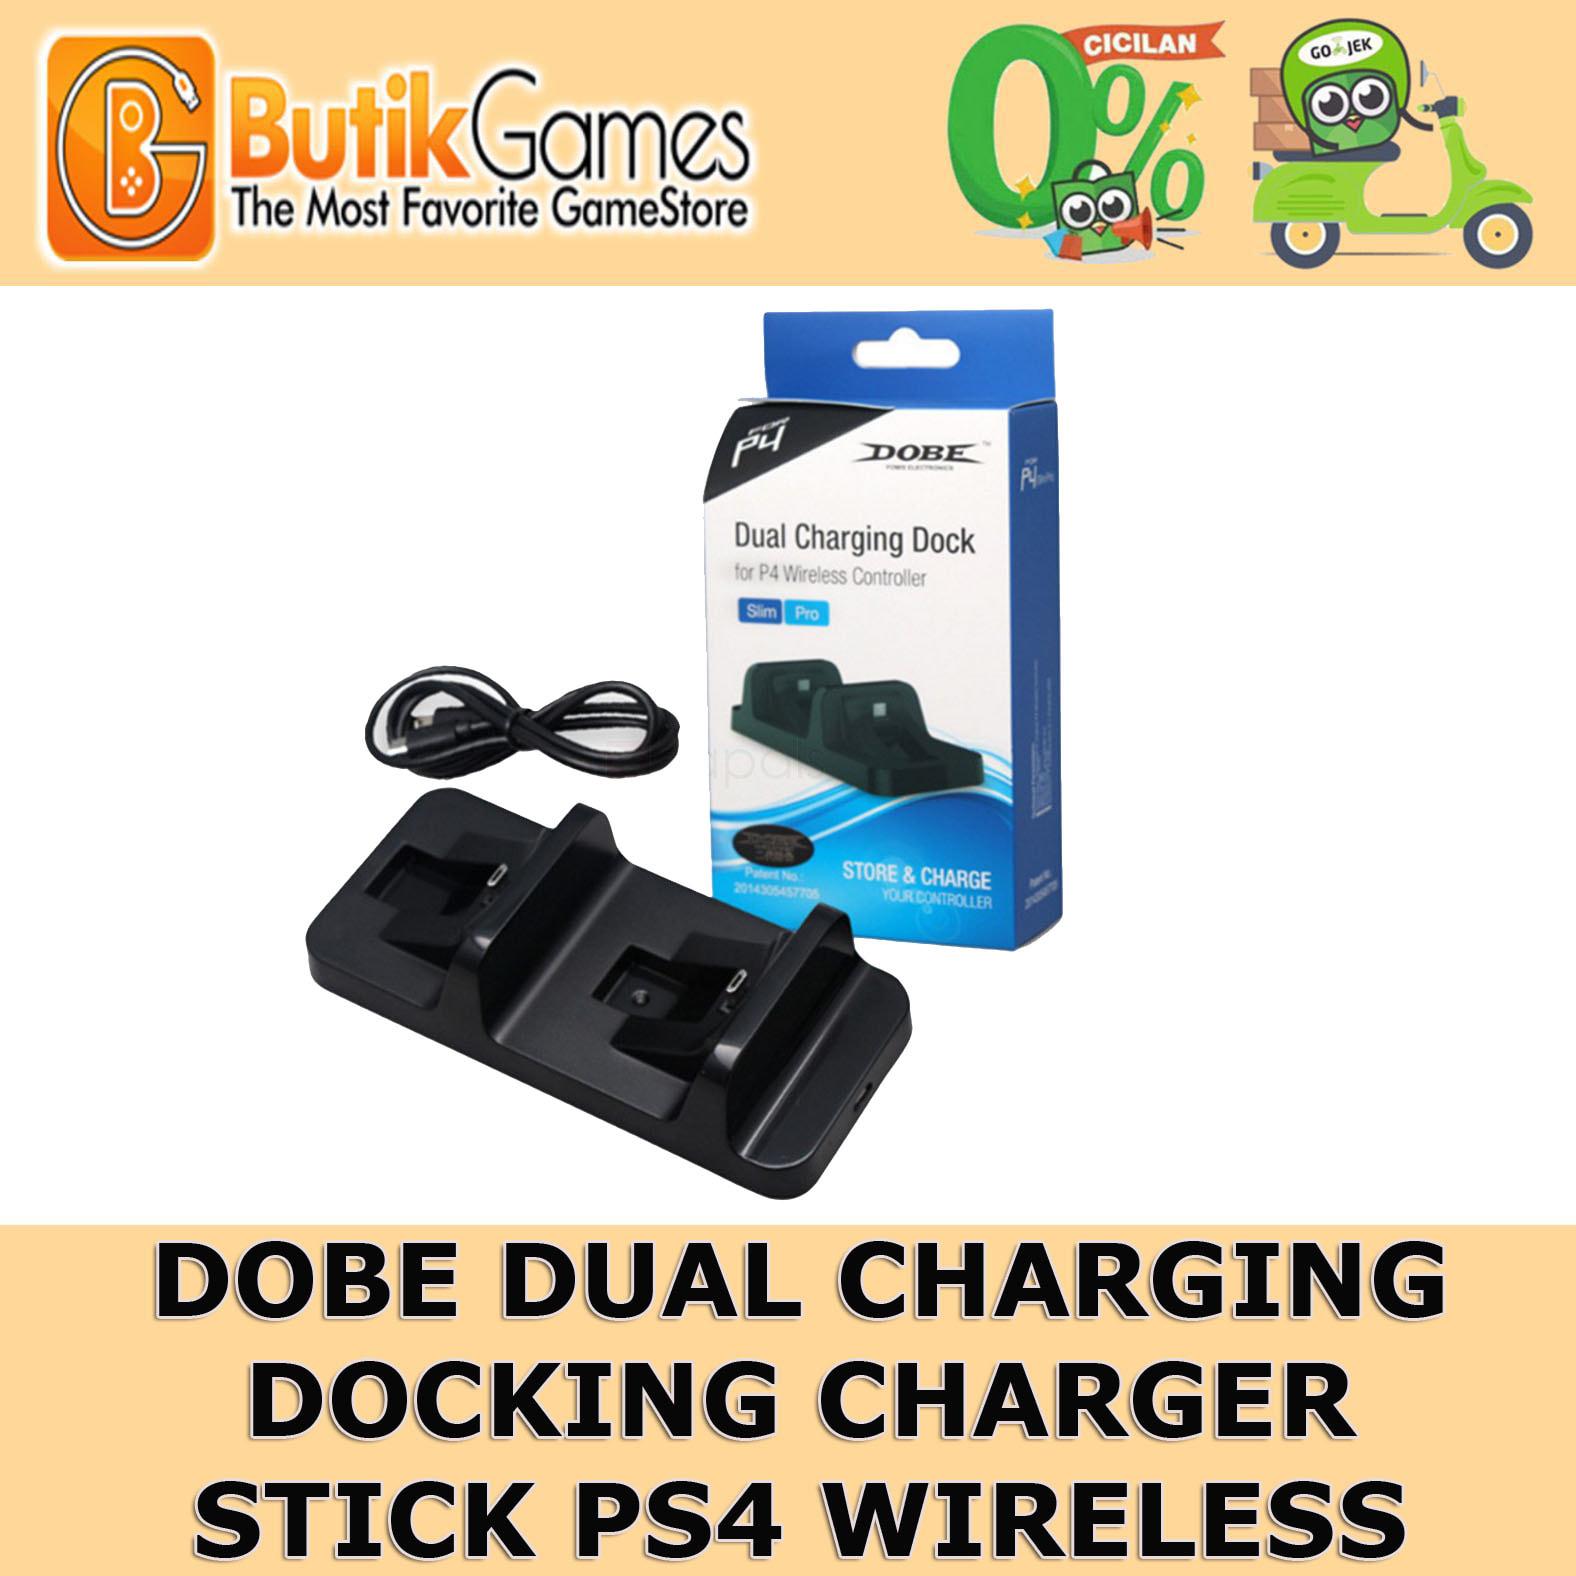 Jual Dobe Dual Charging Dock Ps4 Charger Stick Double Slim Pro Butikgames Tokopedia